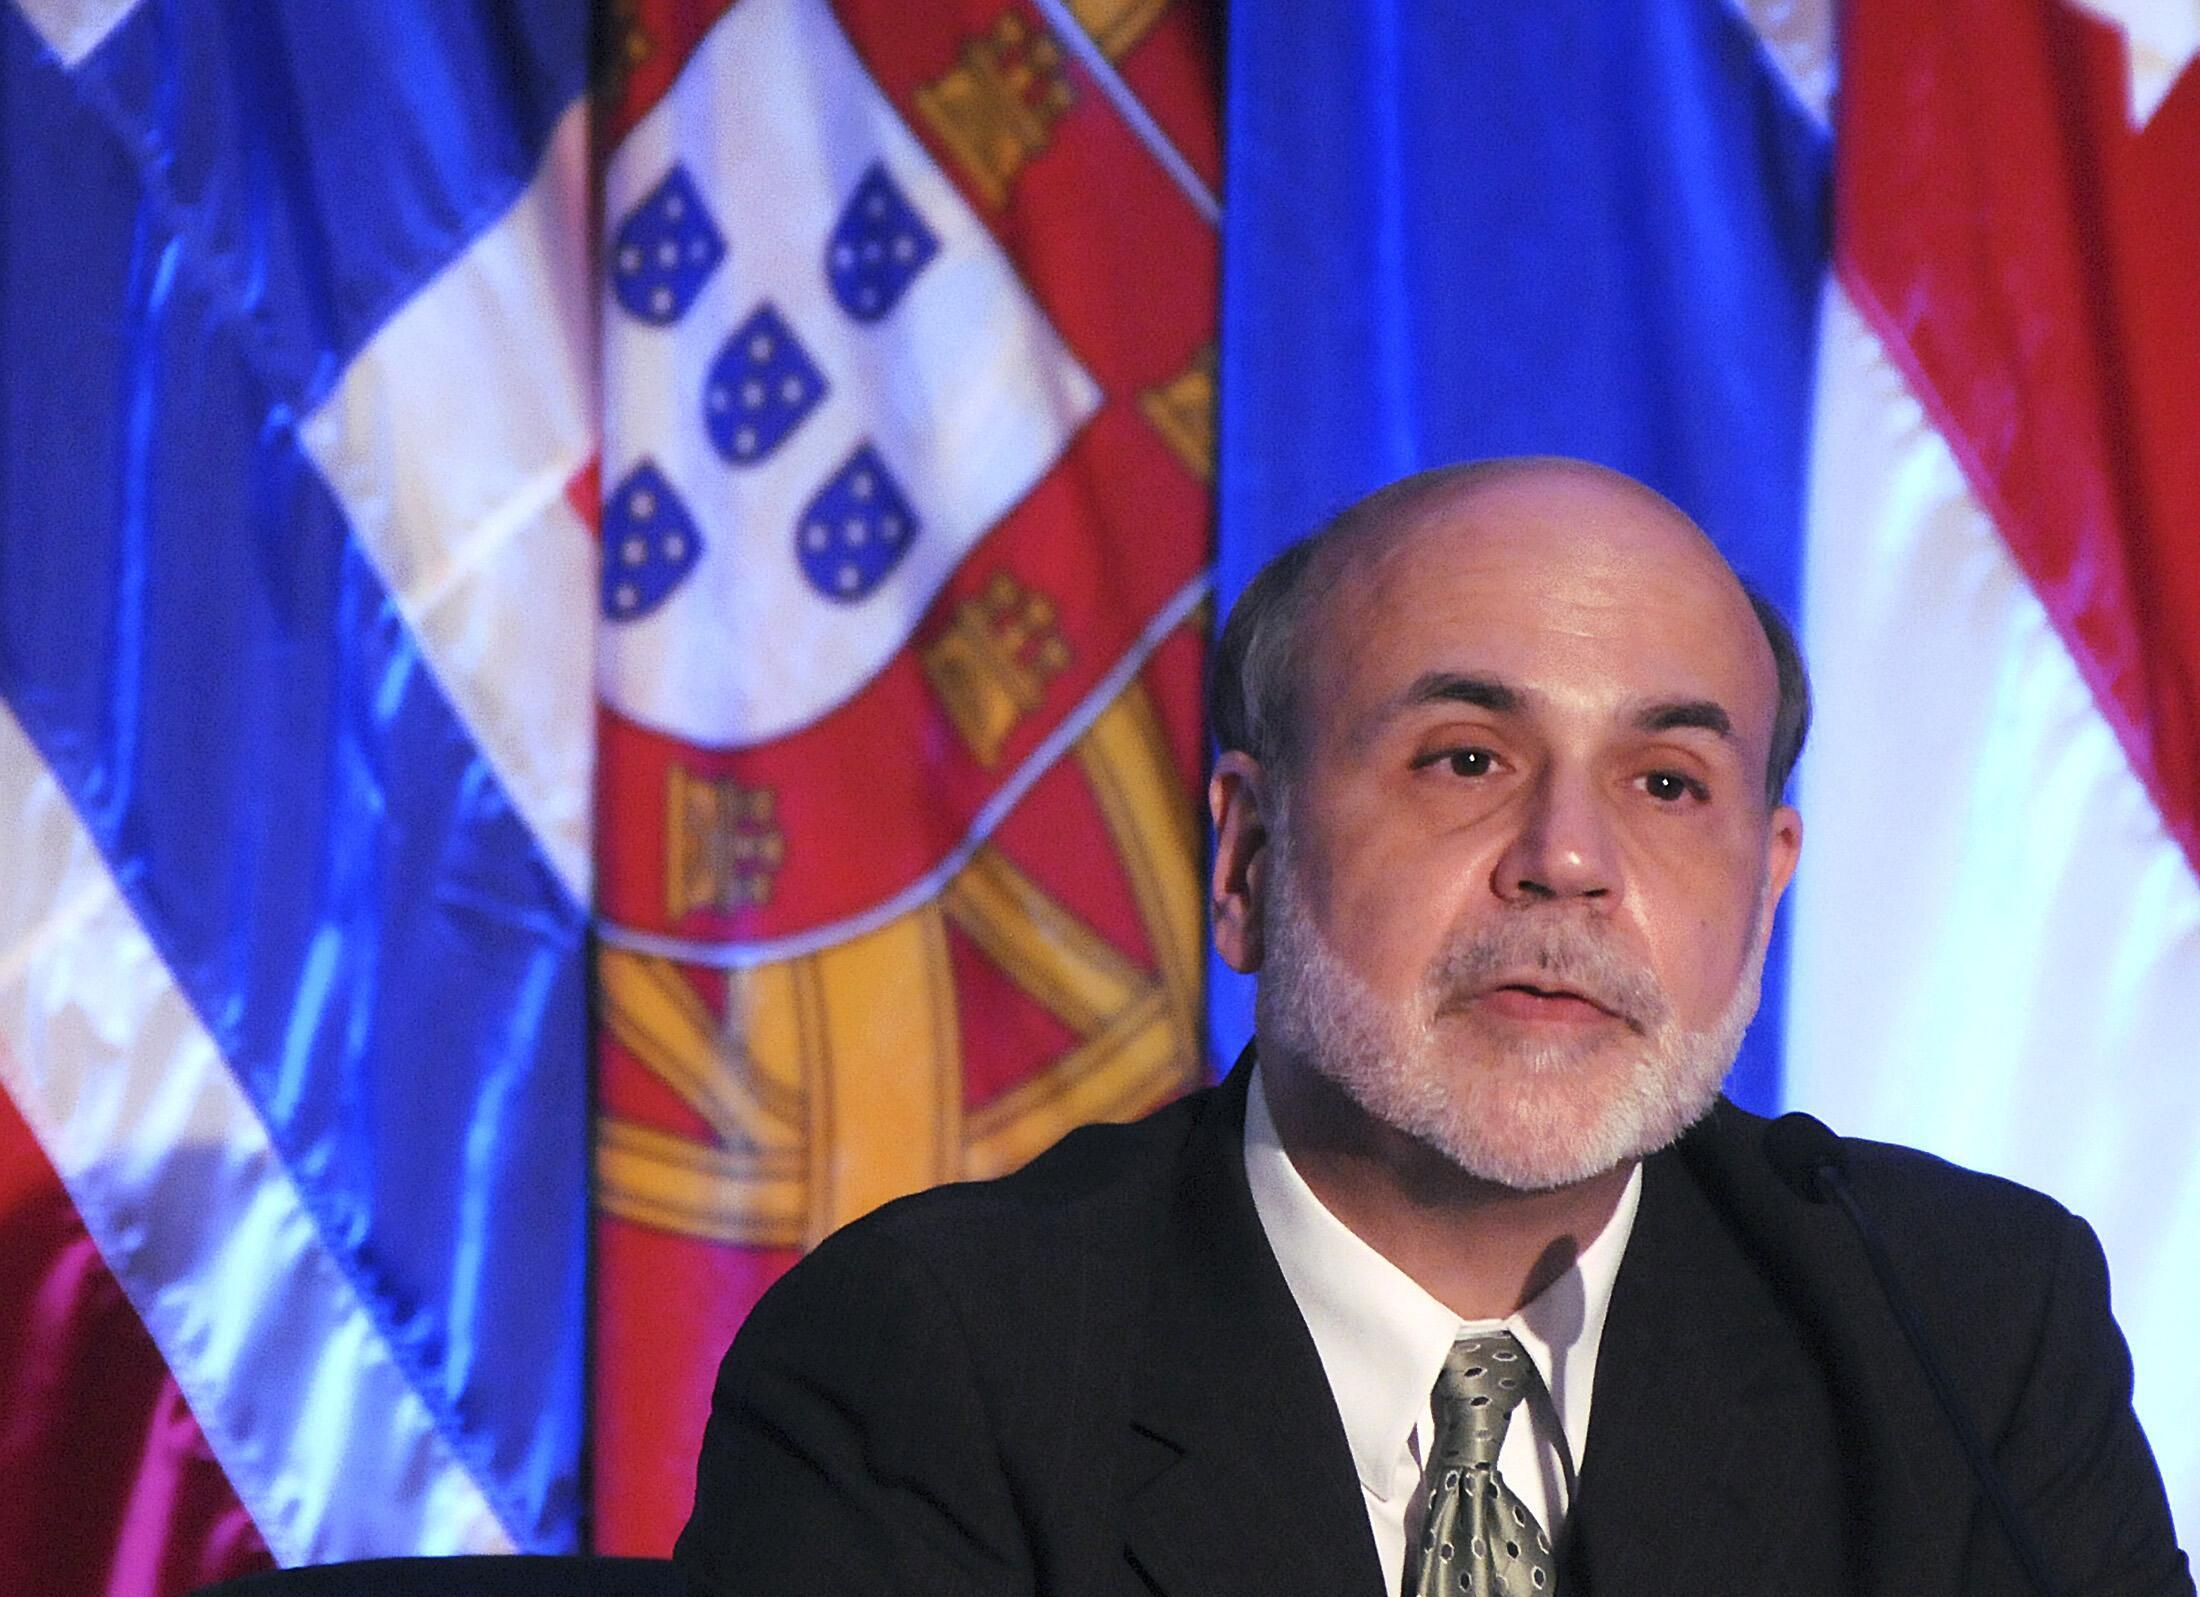 presidente do Federal Reserve (Fed), Ben Bernanke